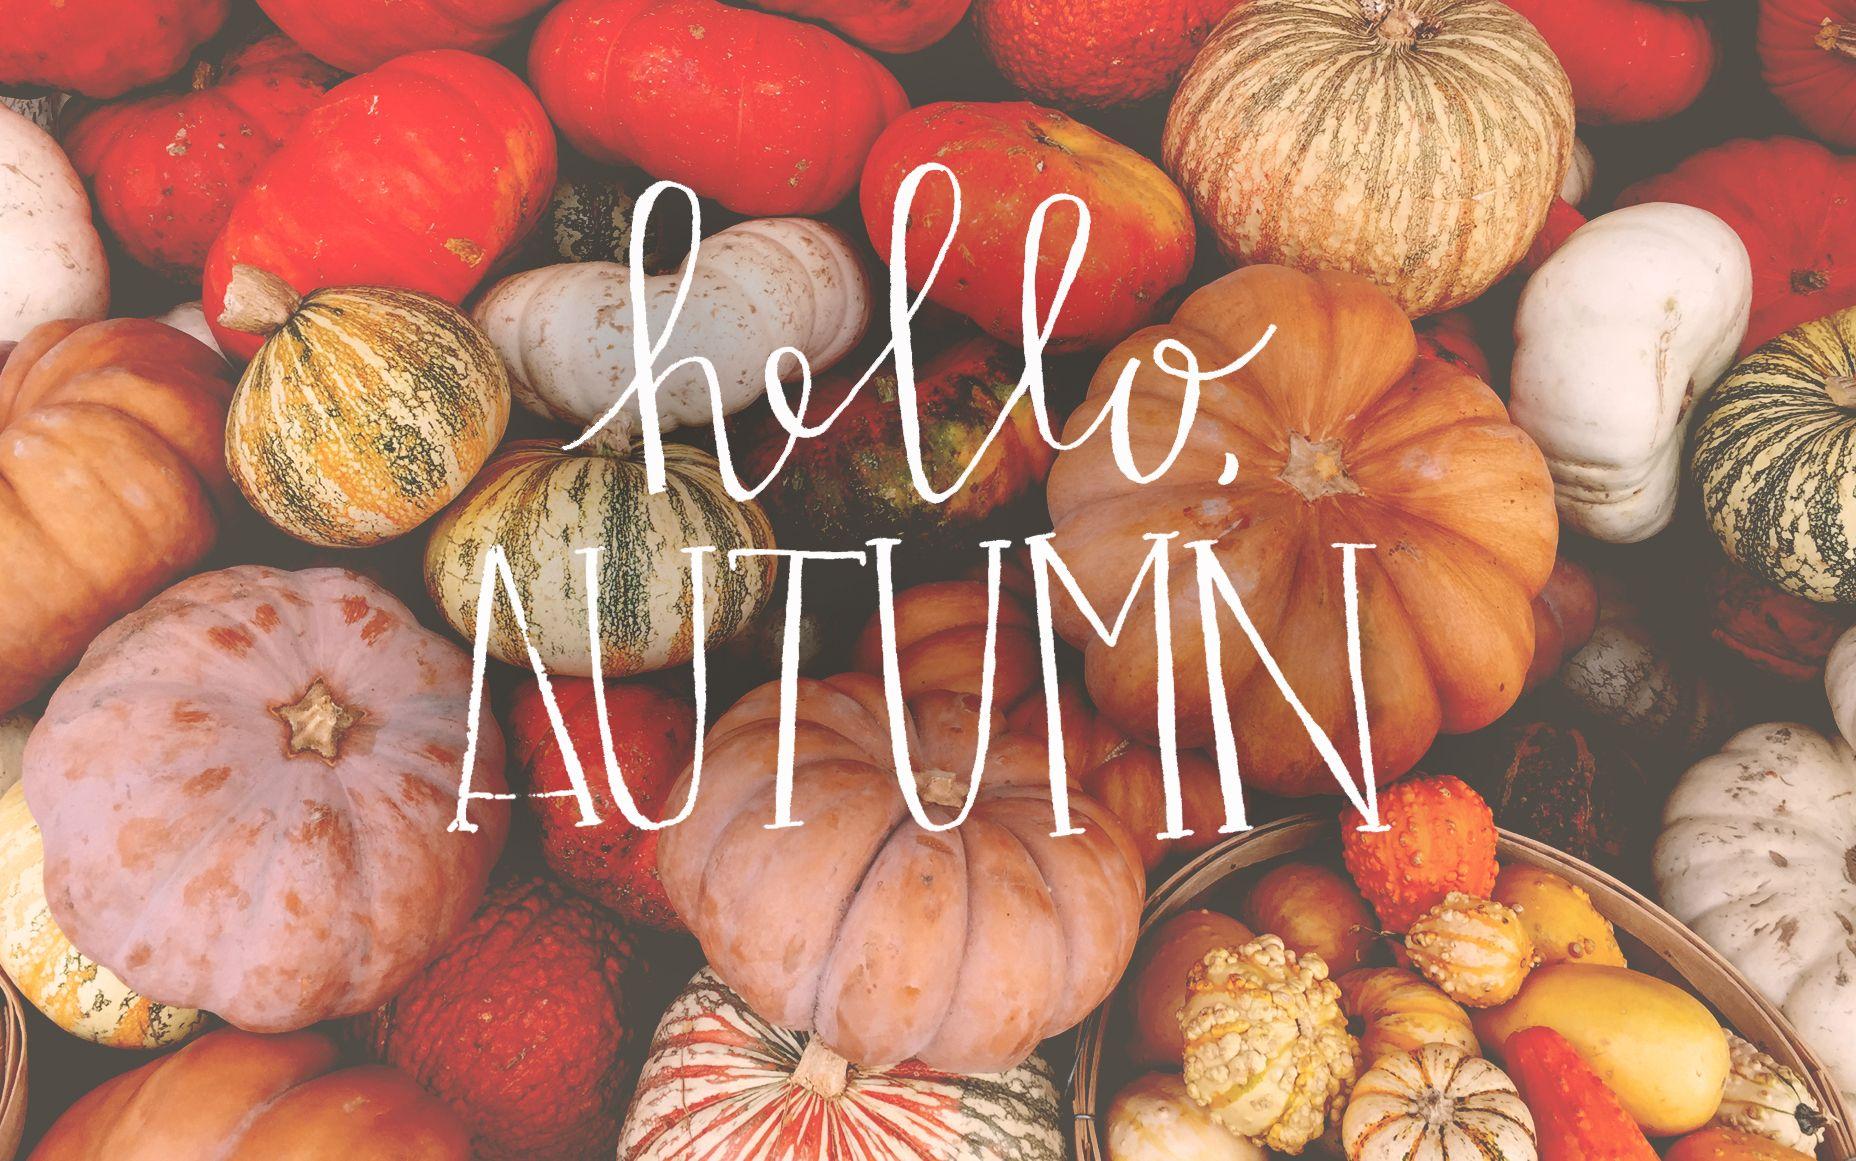 Wonderful Wallpaper Mac Autumn - 034810664d96ff2ef0f86e2b0210c5eb  Best Photo Reference_428236.jpg